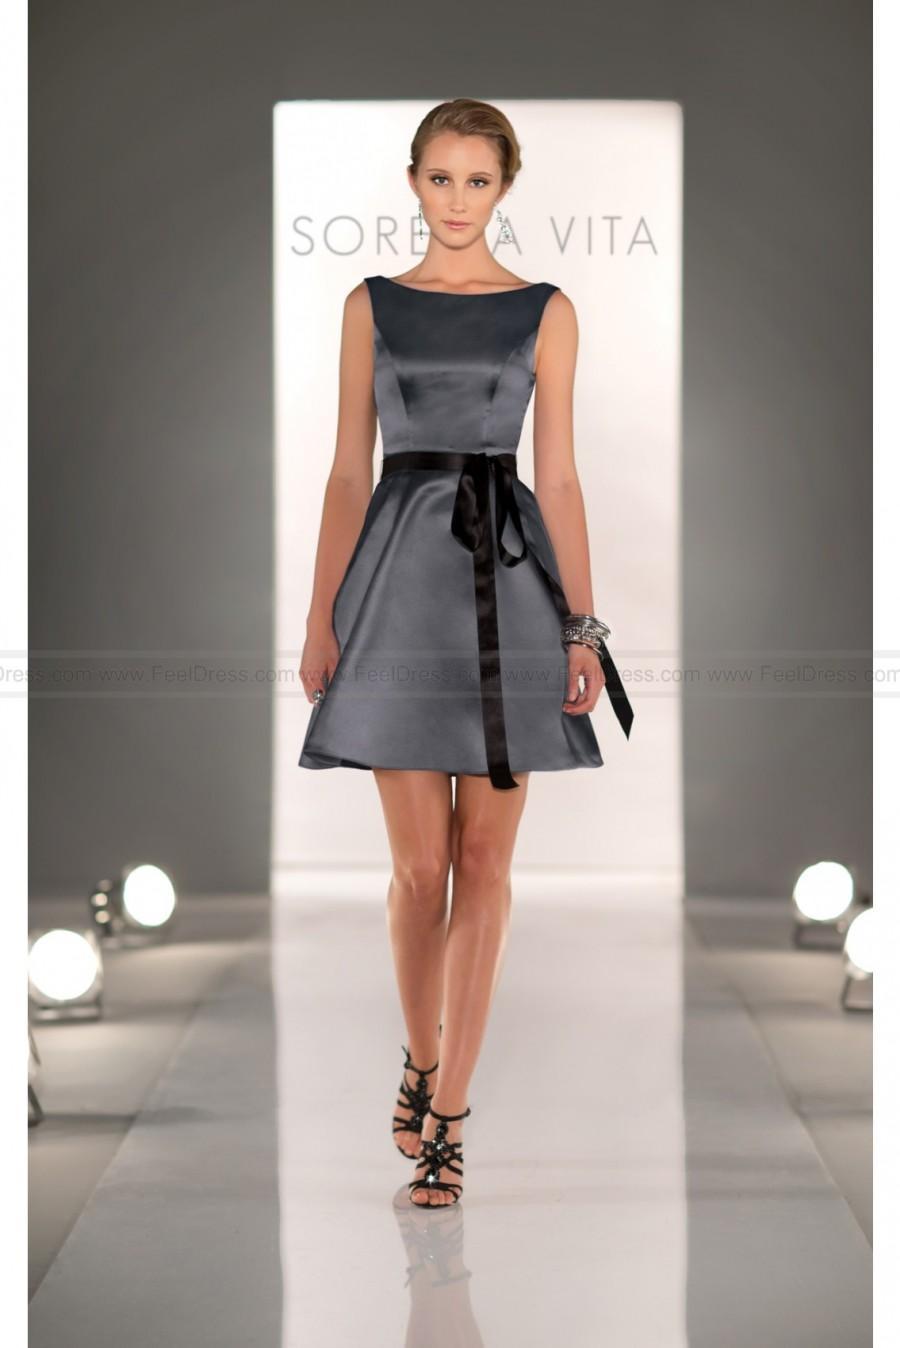 Sorella vita charcoal bridesmaid dress style 8279 2445614 weddbook sorella vita charcoal bridesmaid dress style 8279 ombrellifo Images